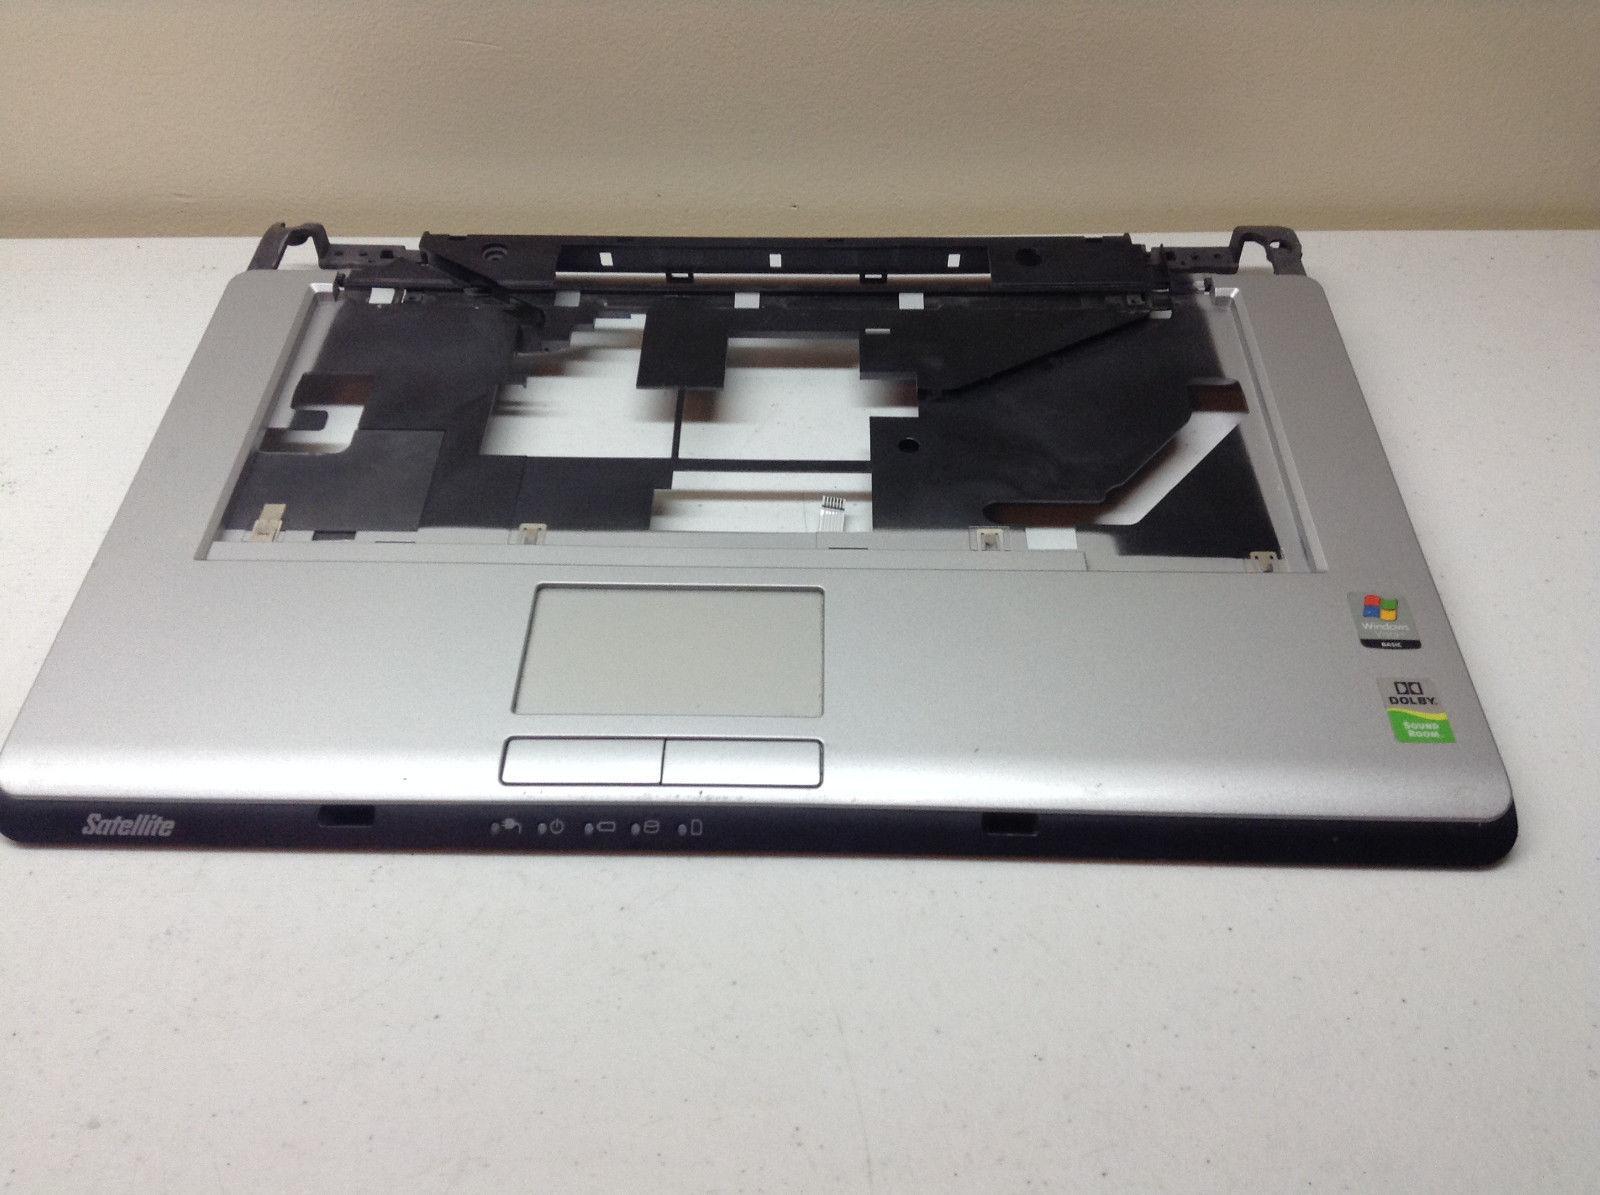 Toshiba Satellite A215-S7416 Palmrest - Touchpad V000101770